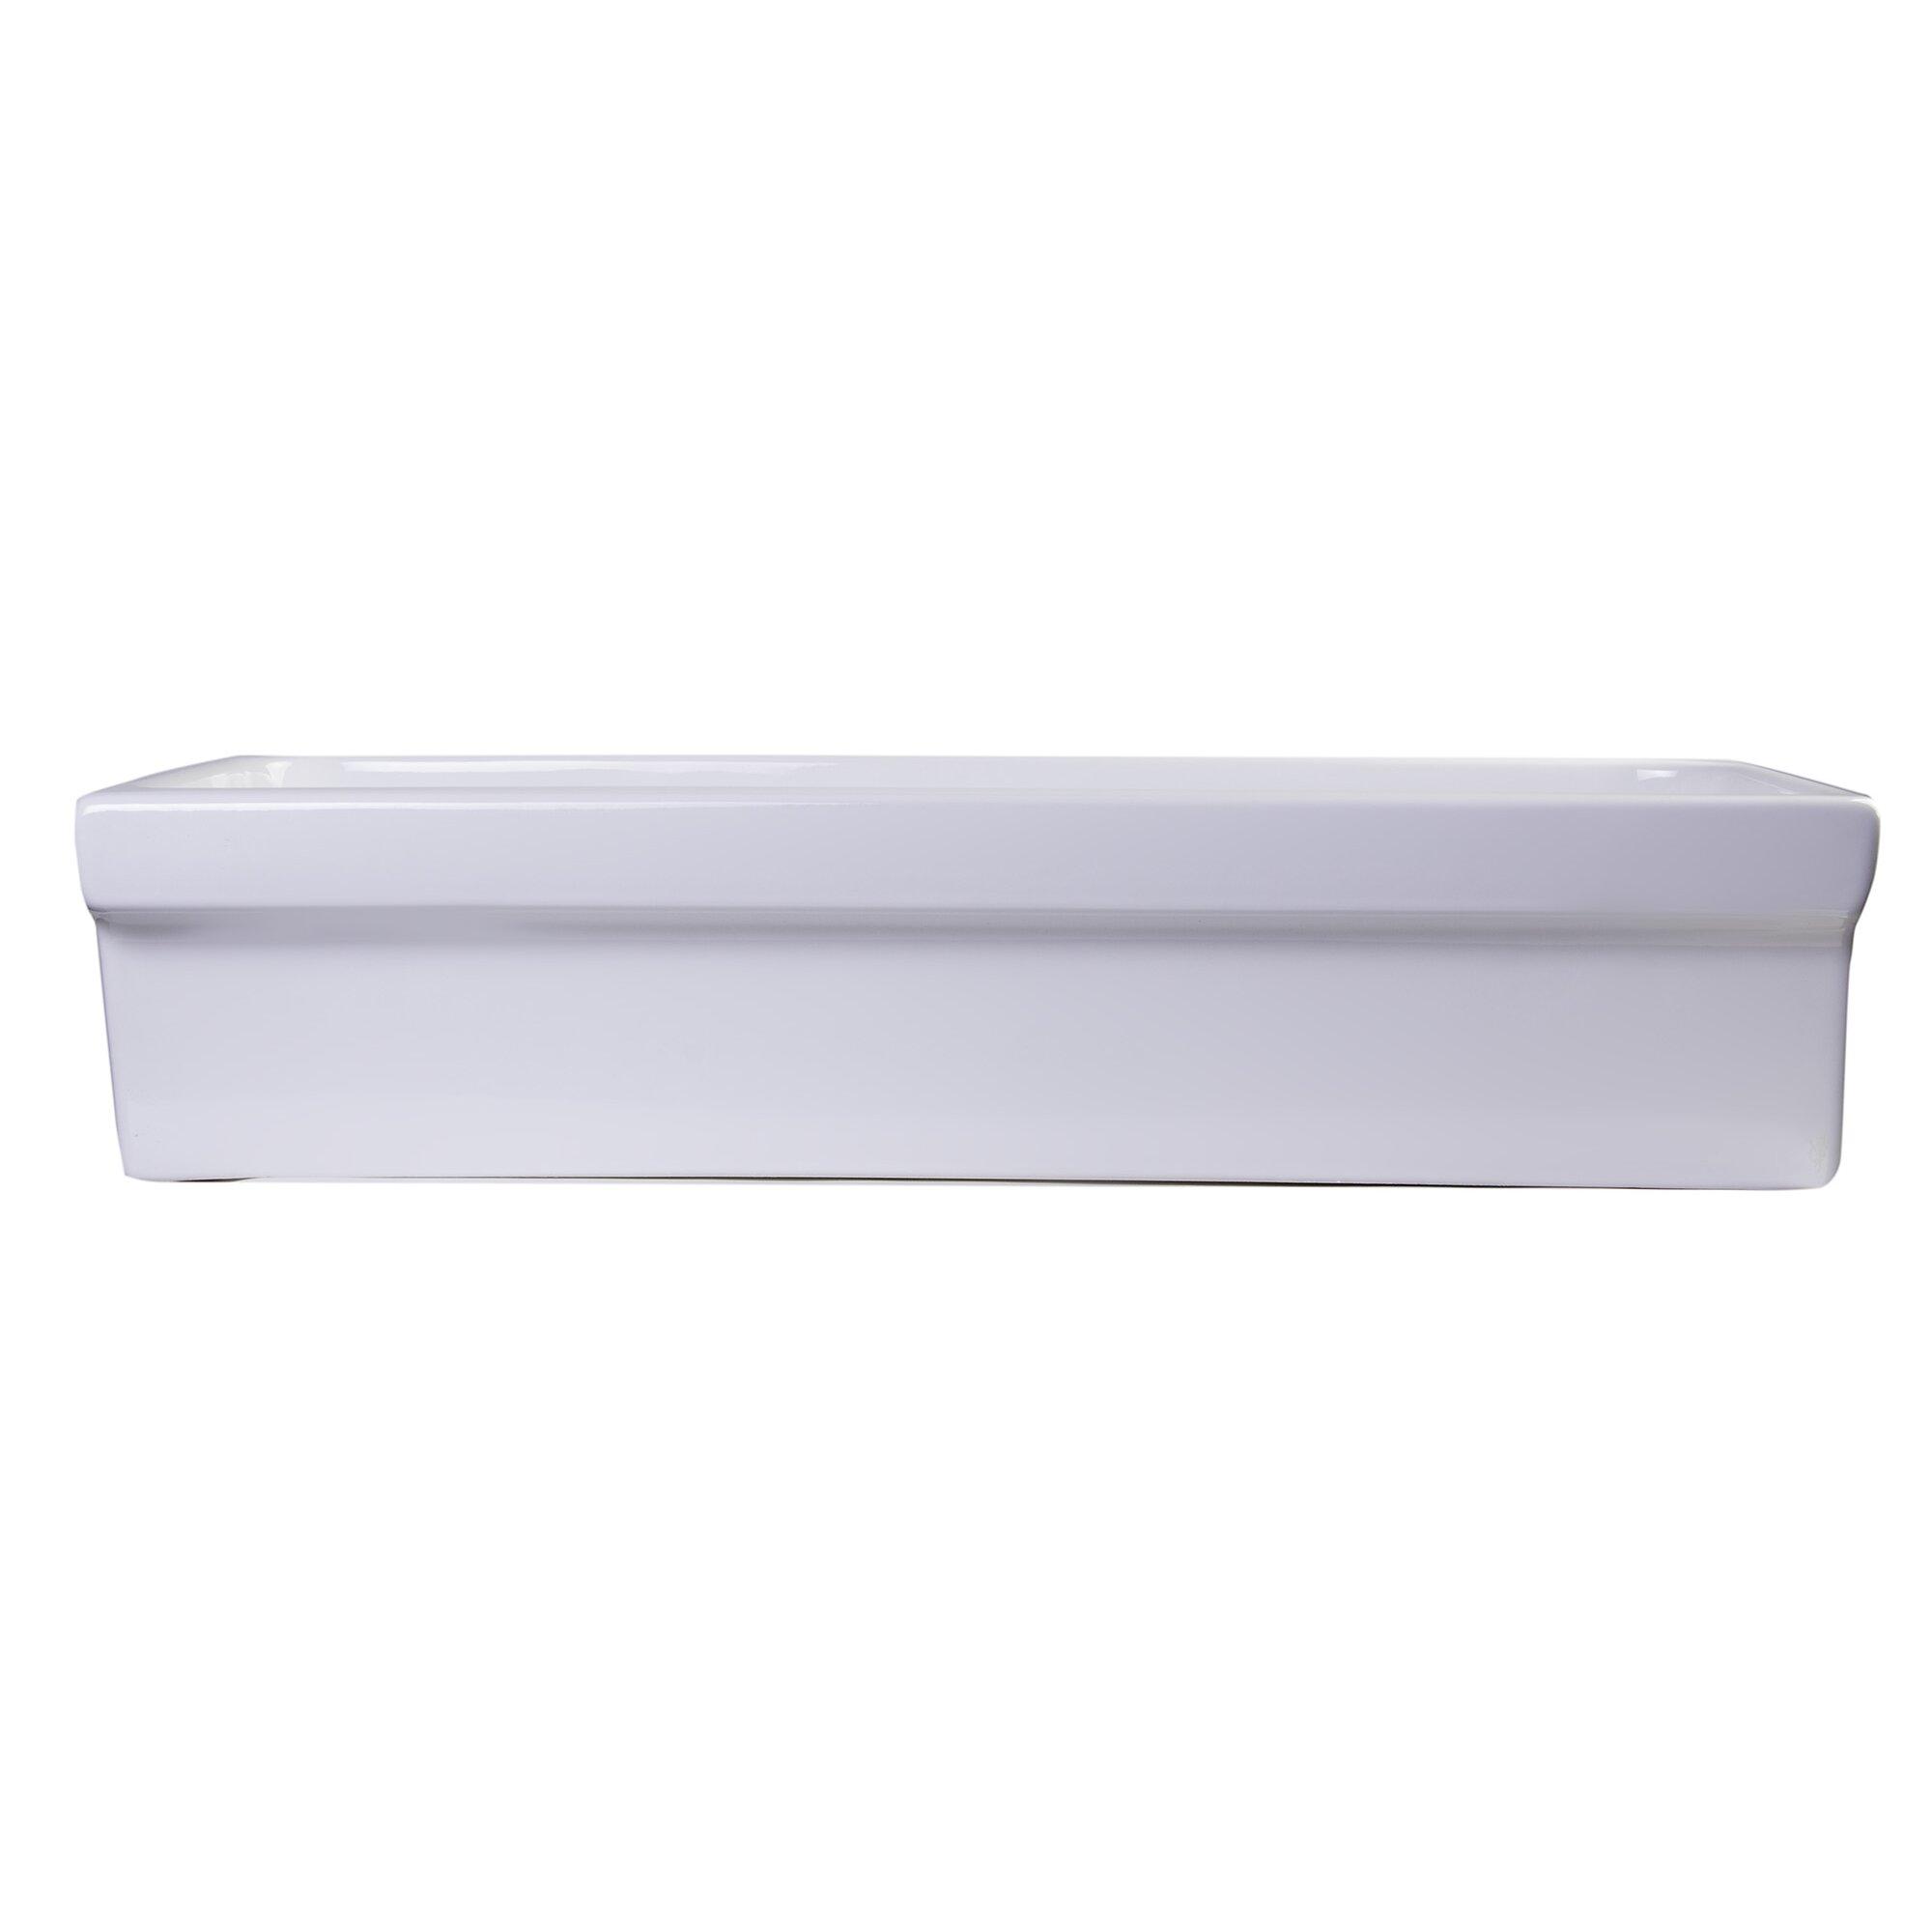 Bathroom Sink Brands : 35.5